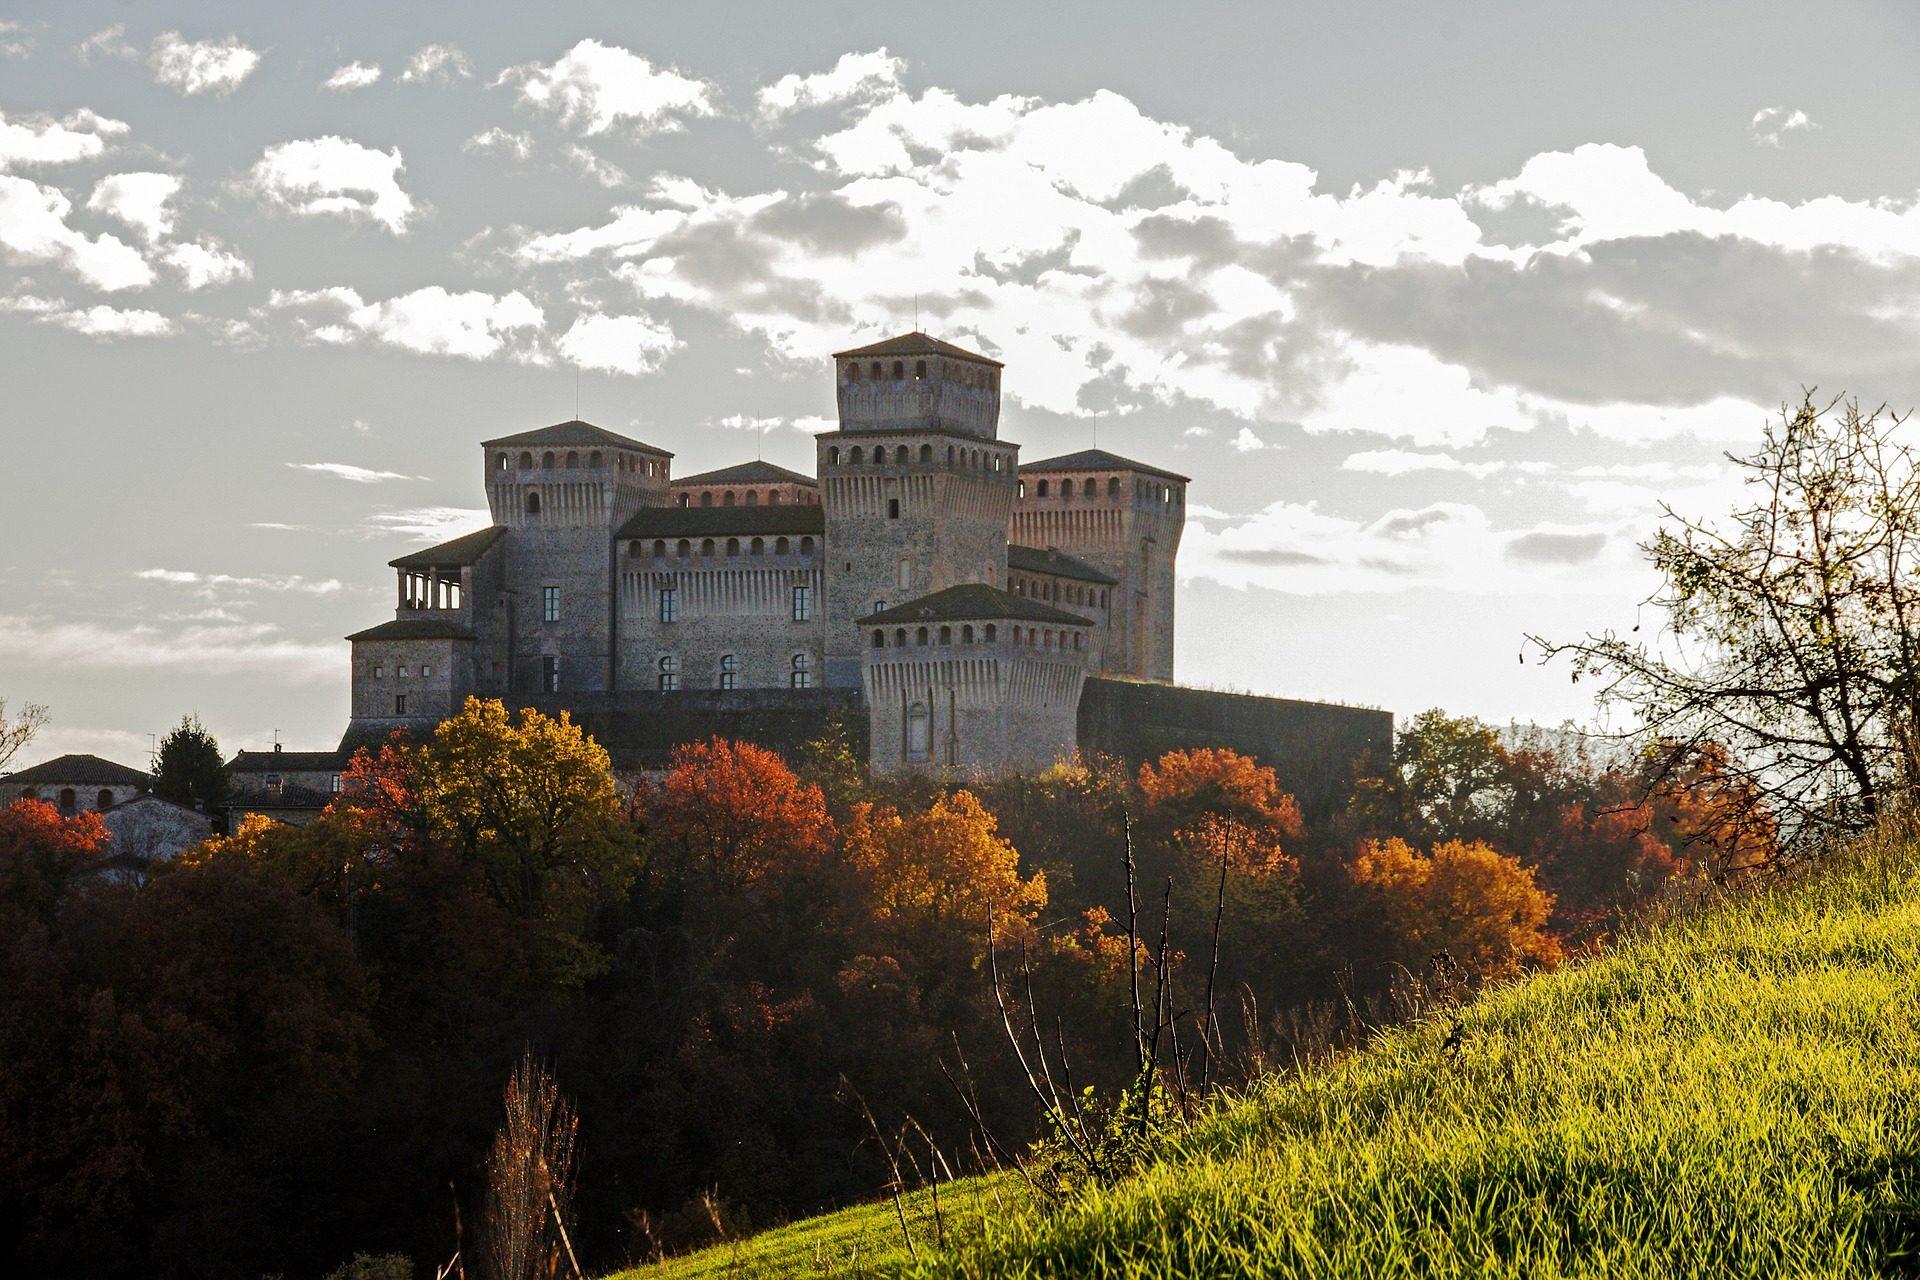 Castelo, Torres, torrar, Langhirano, Parma - Papéis de parede HD - Professor-falken.com